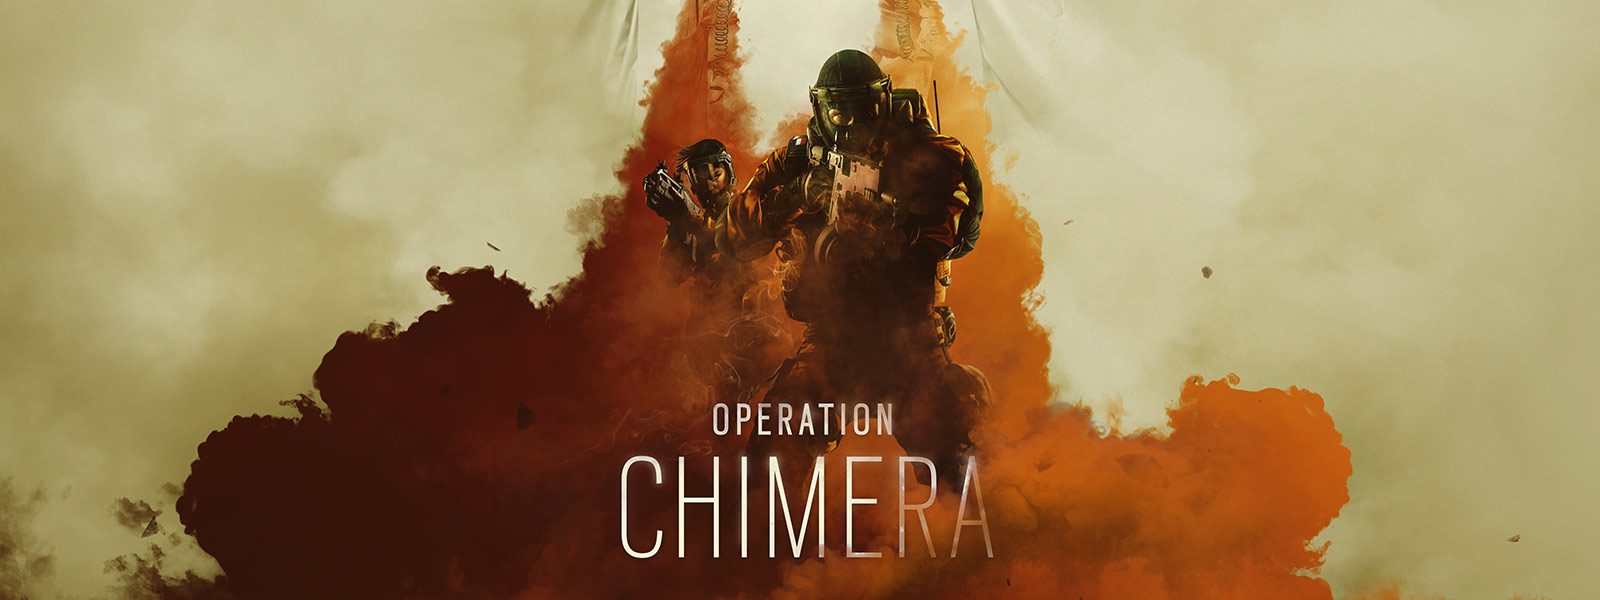 Operation Chimera, 2명의 오퍼레이터들이 가스마스크를 쓴 채 노란색 가스 속을 통과합니다.